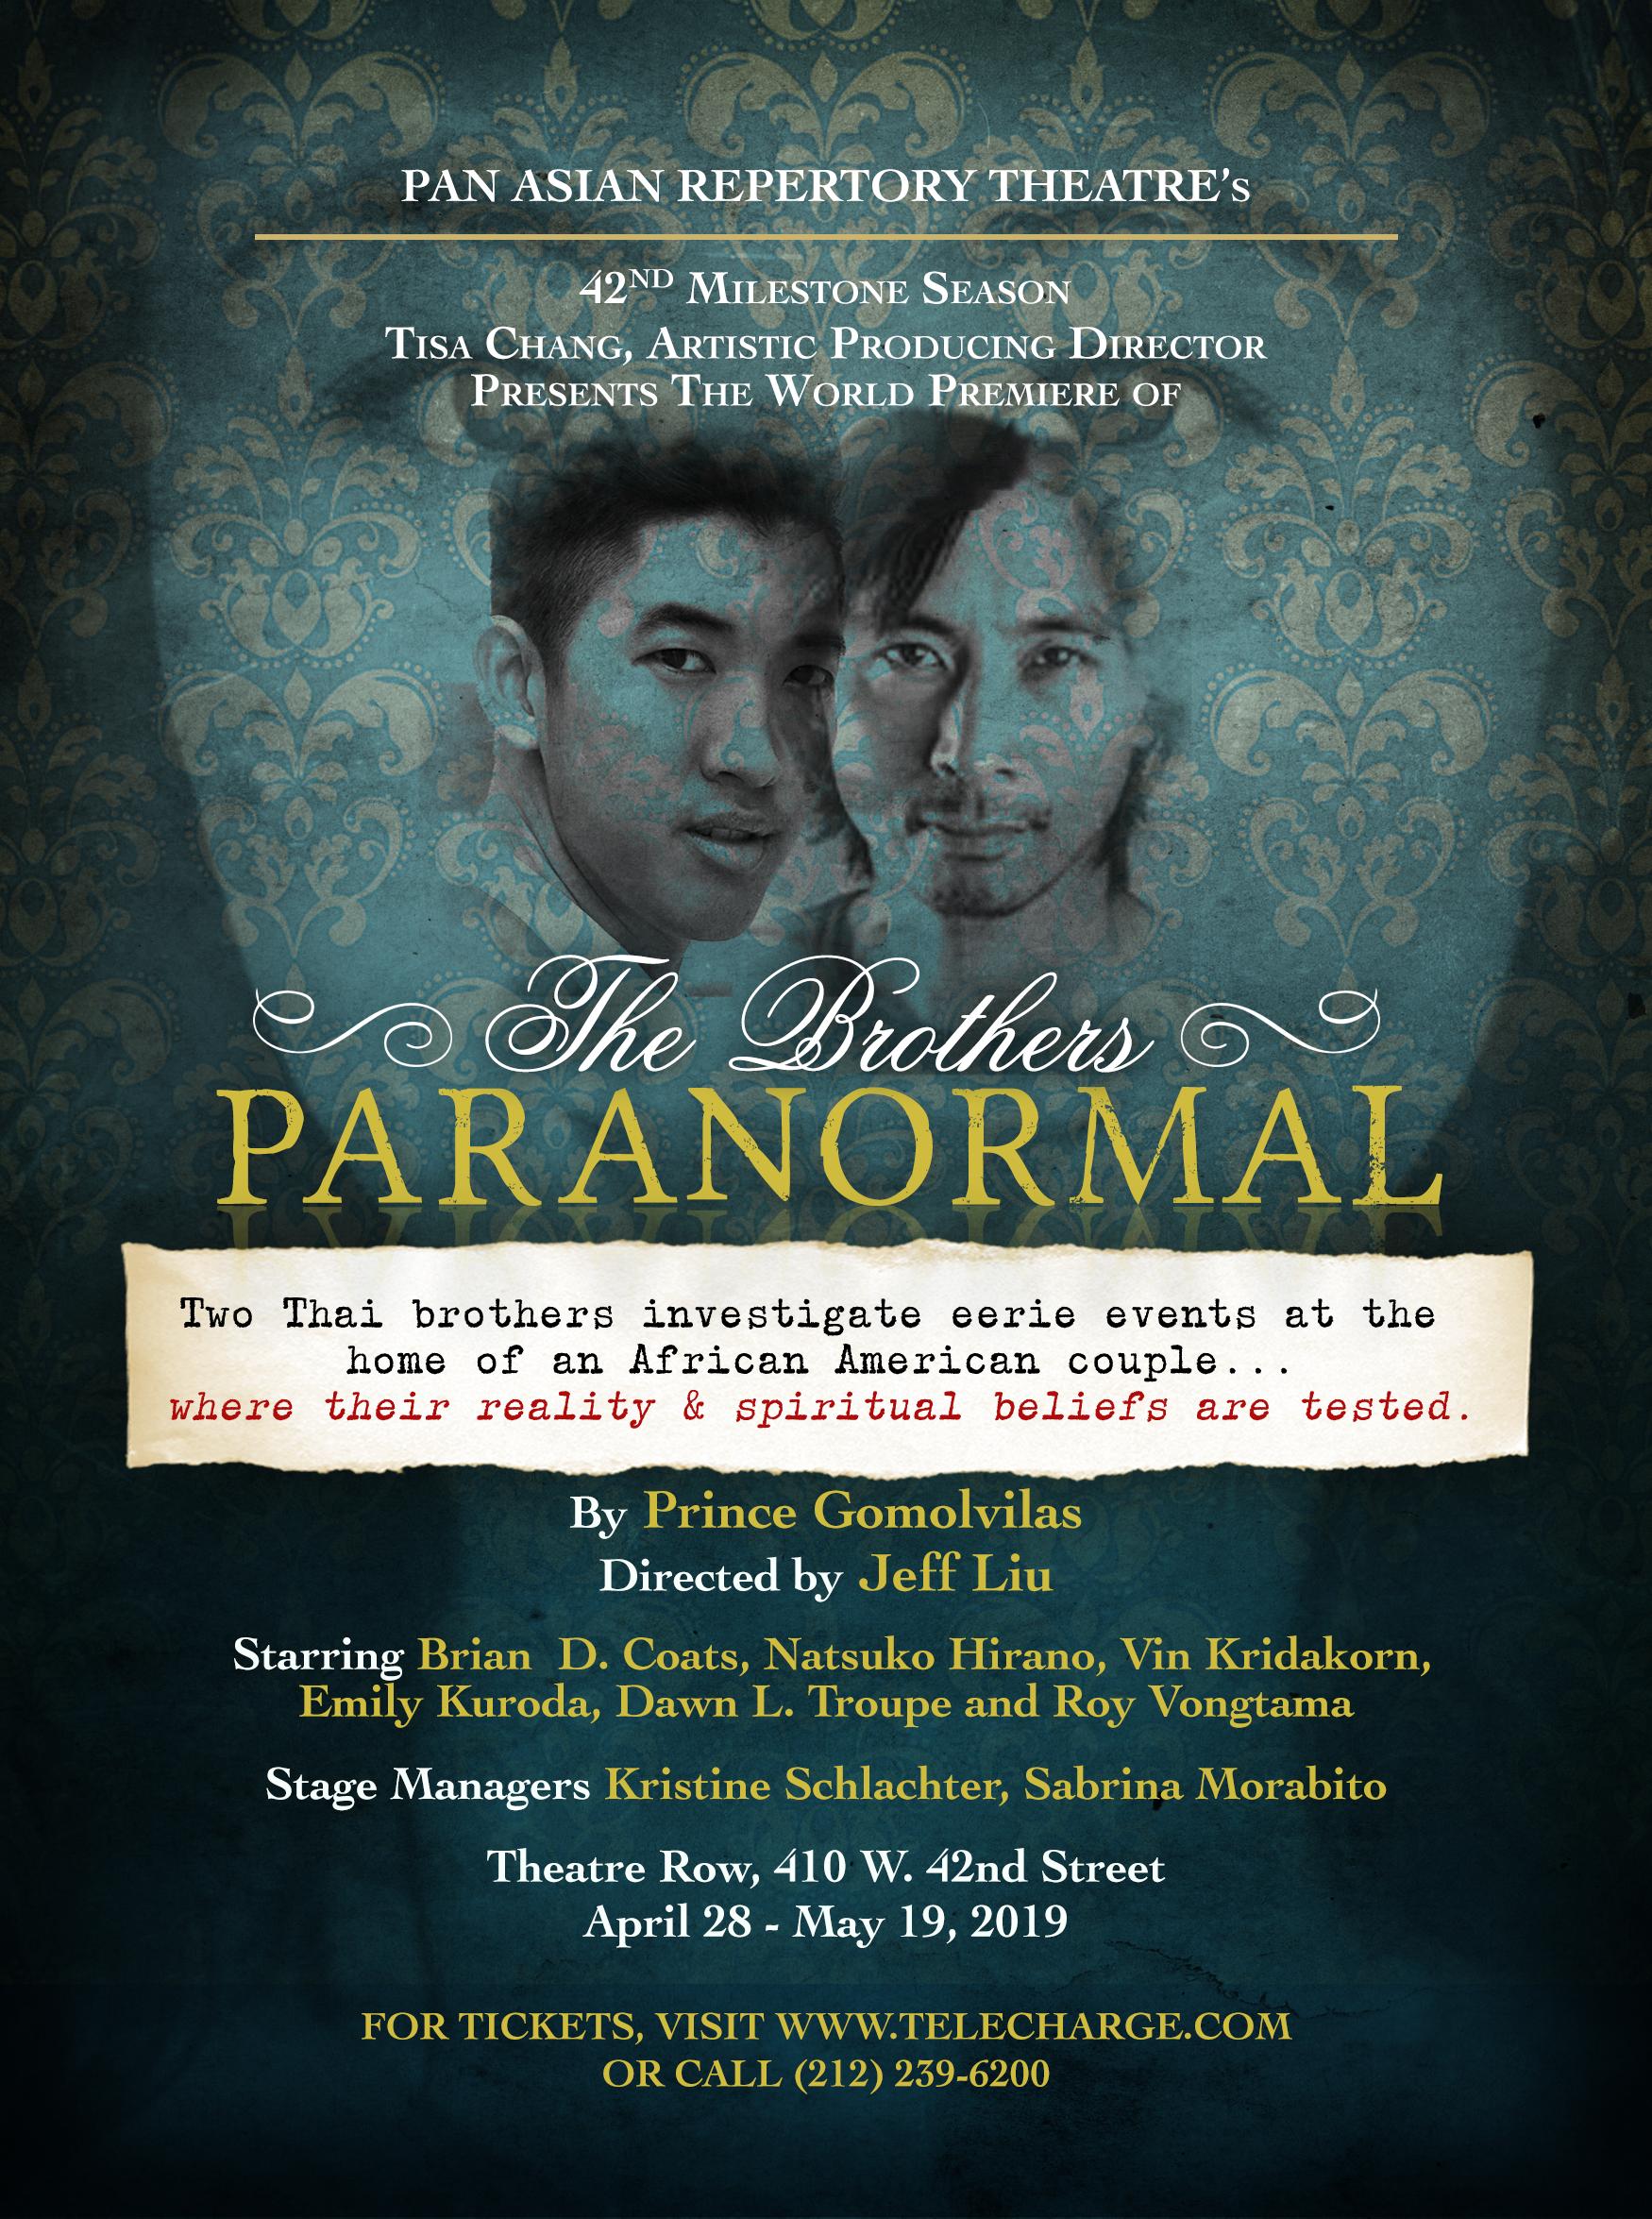 Paranormal - Postcard 3.13.2019.png